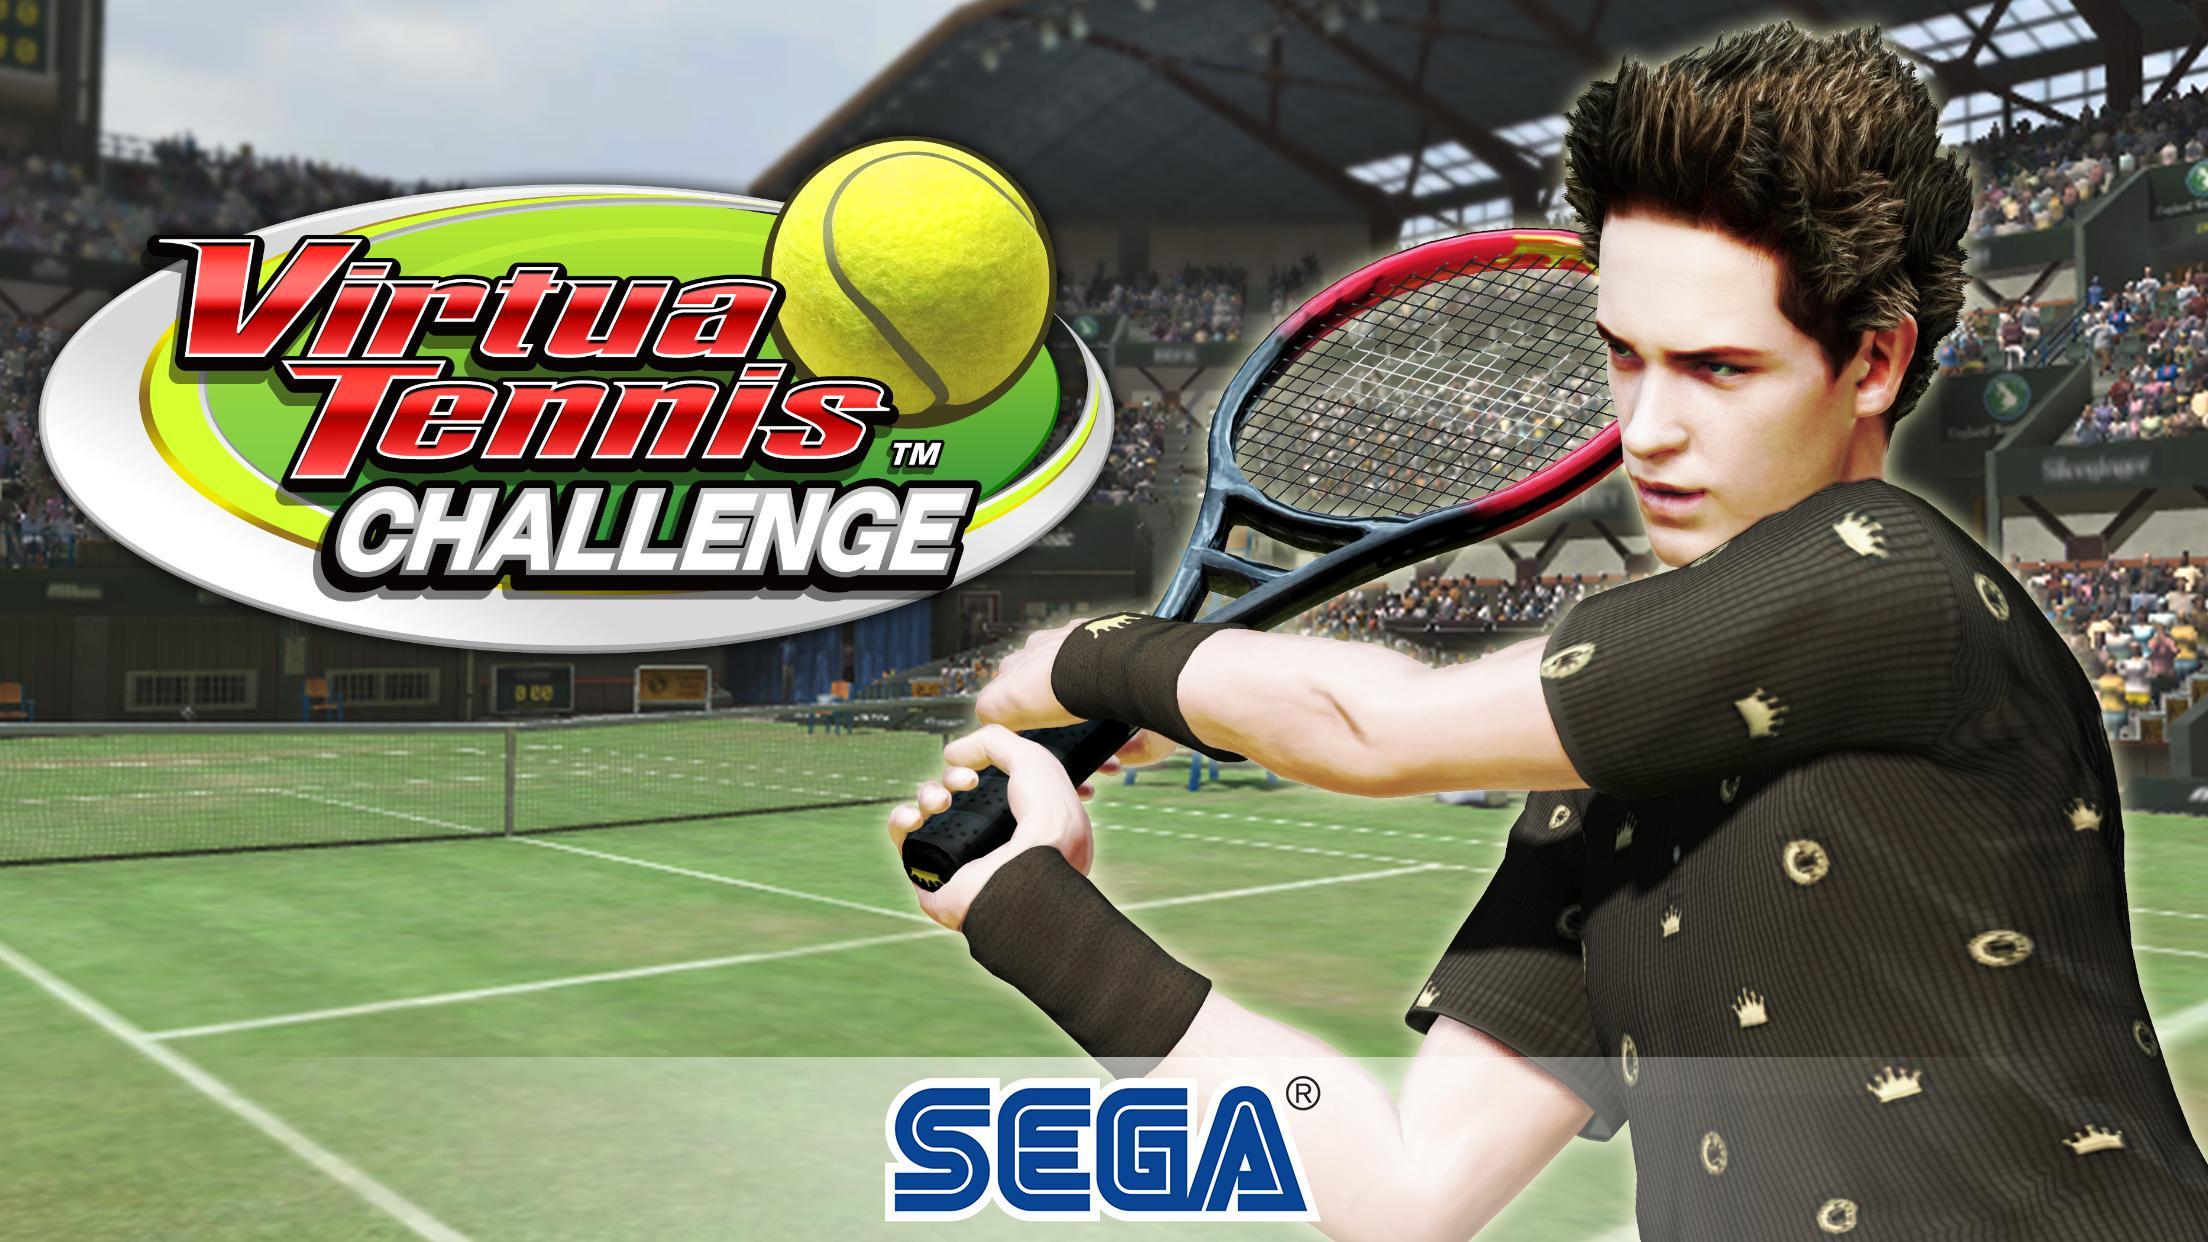 Virtua Tennis Challenge 1.3.6 Screenshot 1